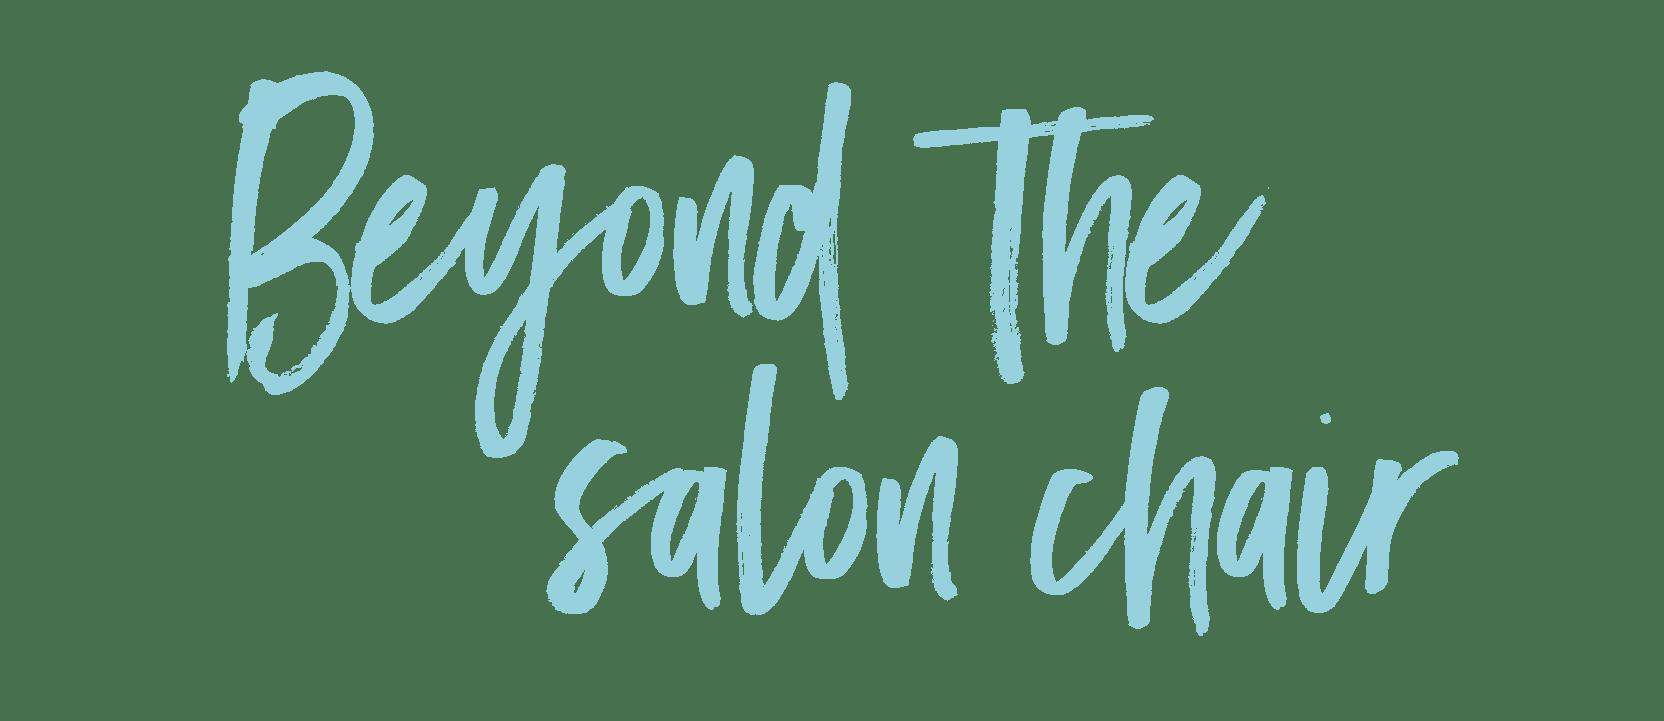 Beyond the salon chair title